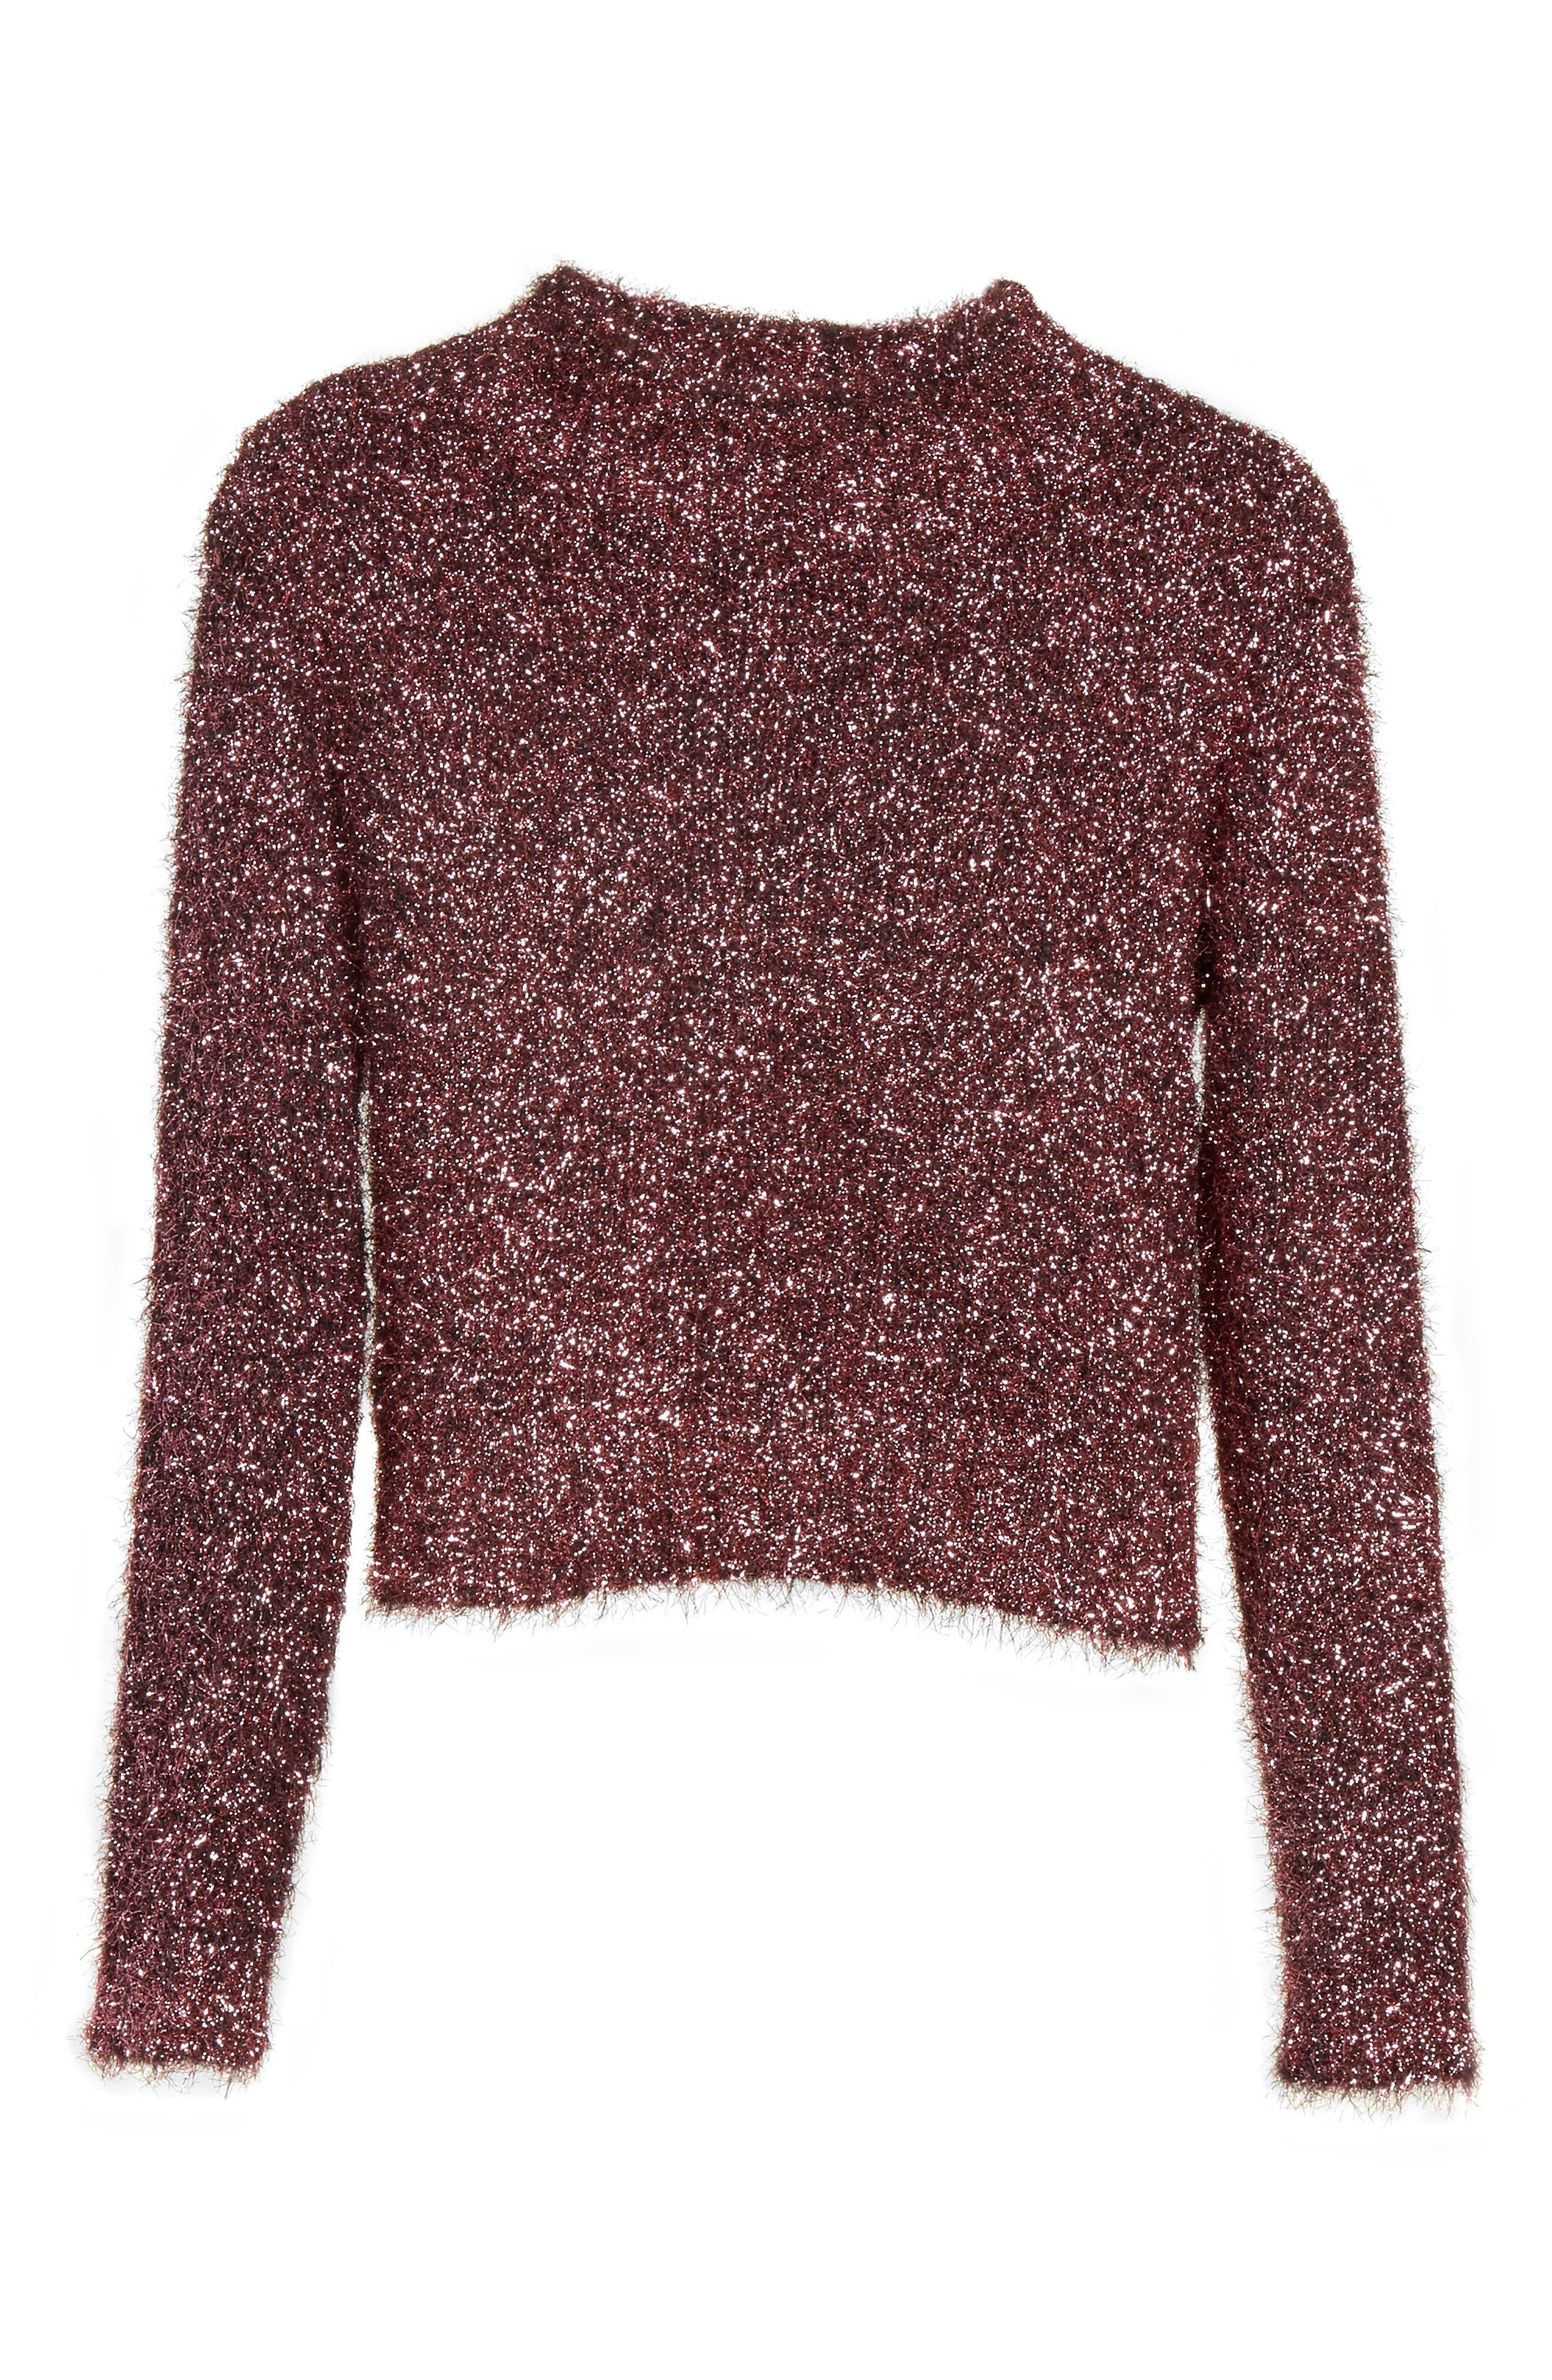 Vaporize Textured Metallic Sweater,                             Alternate thumbnail 6, color,                             Pink